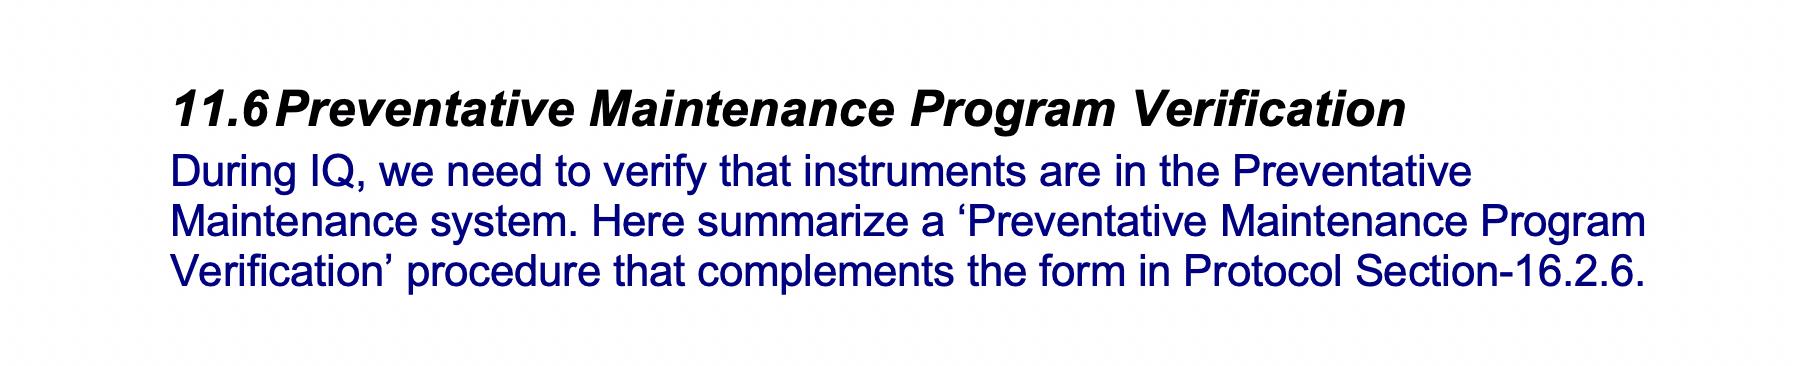 Preventative-Maintenance Program-Verification-GetReskilled